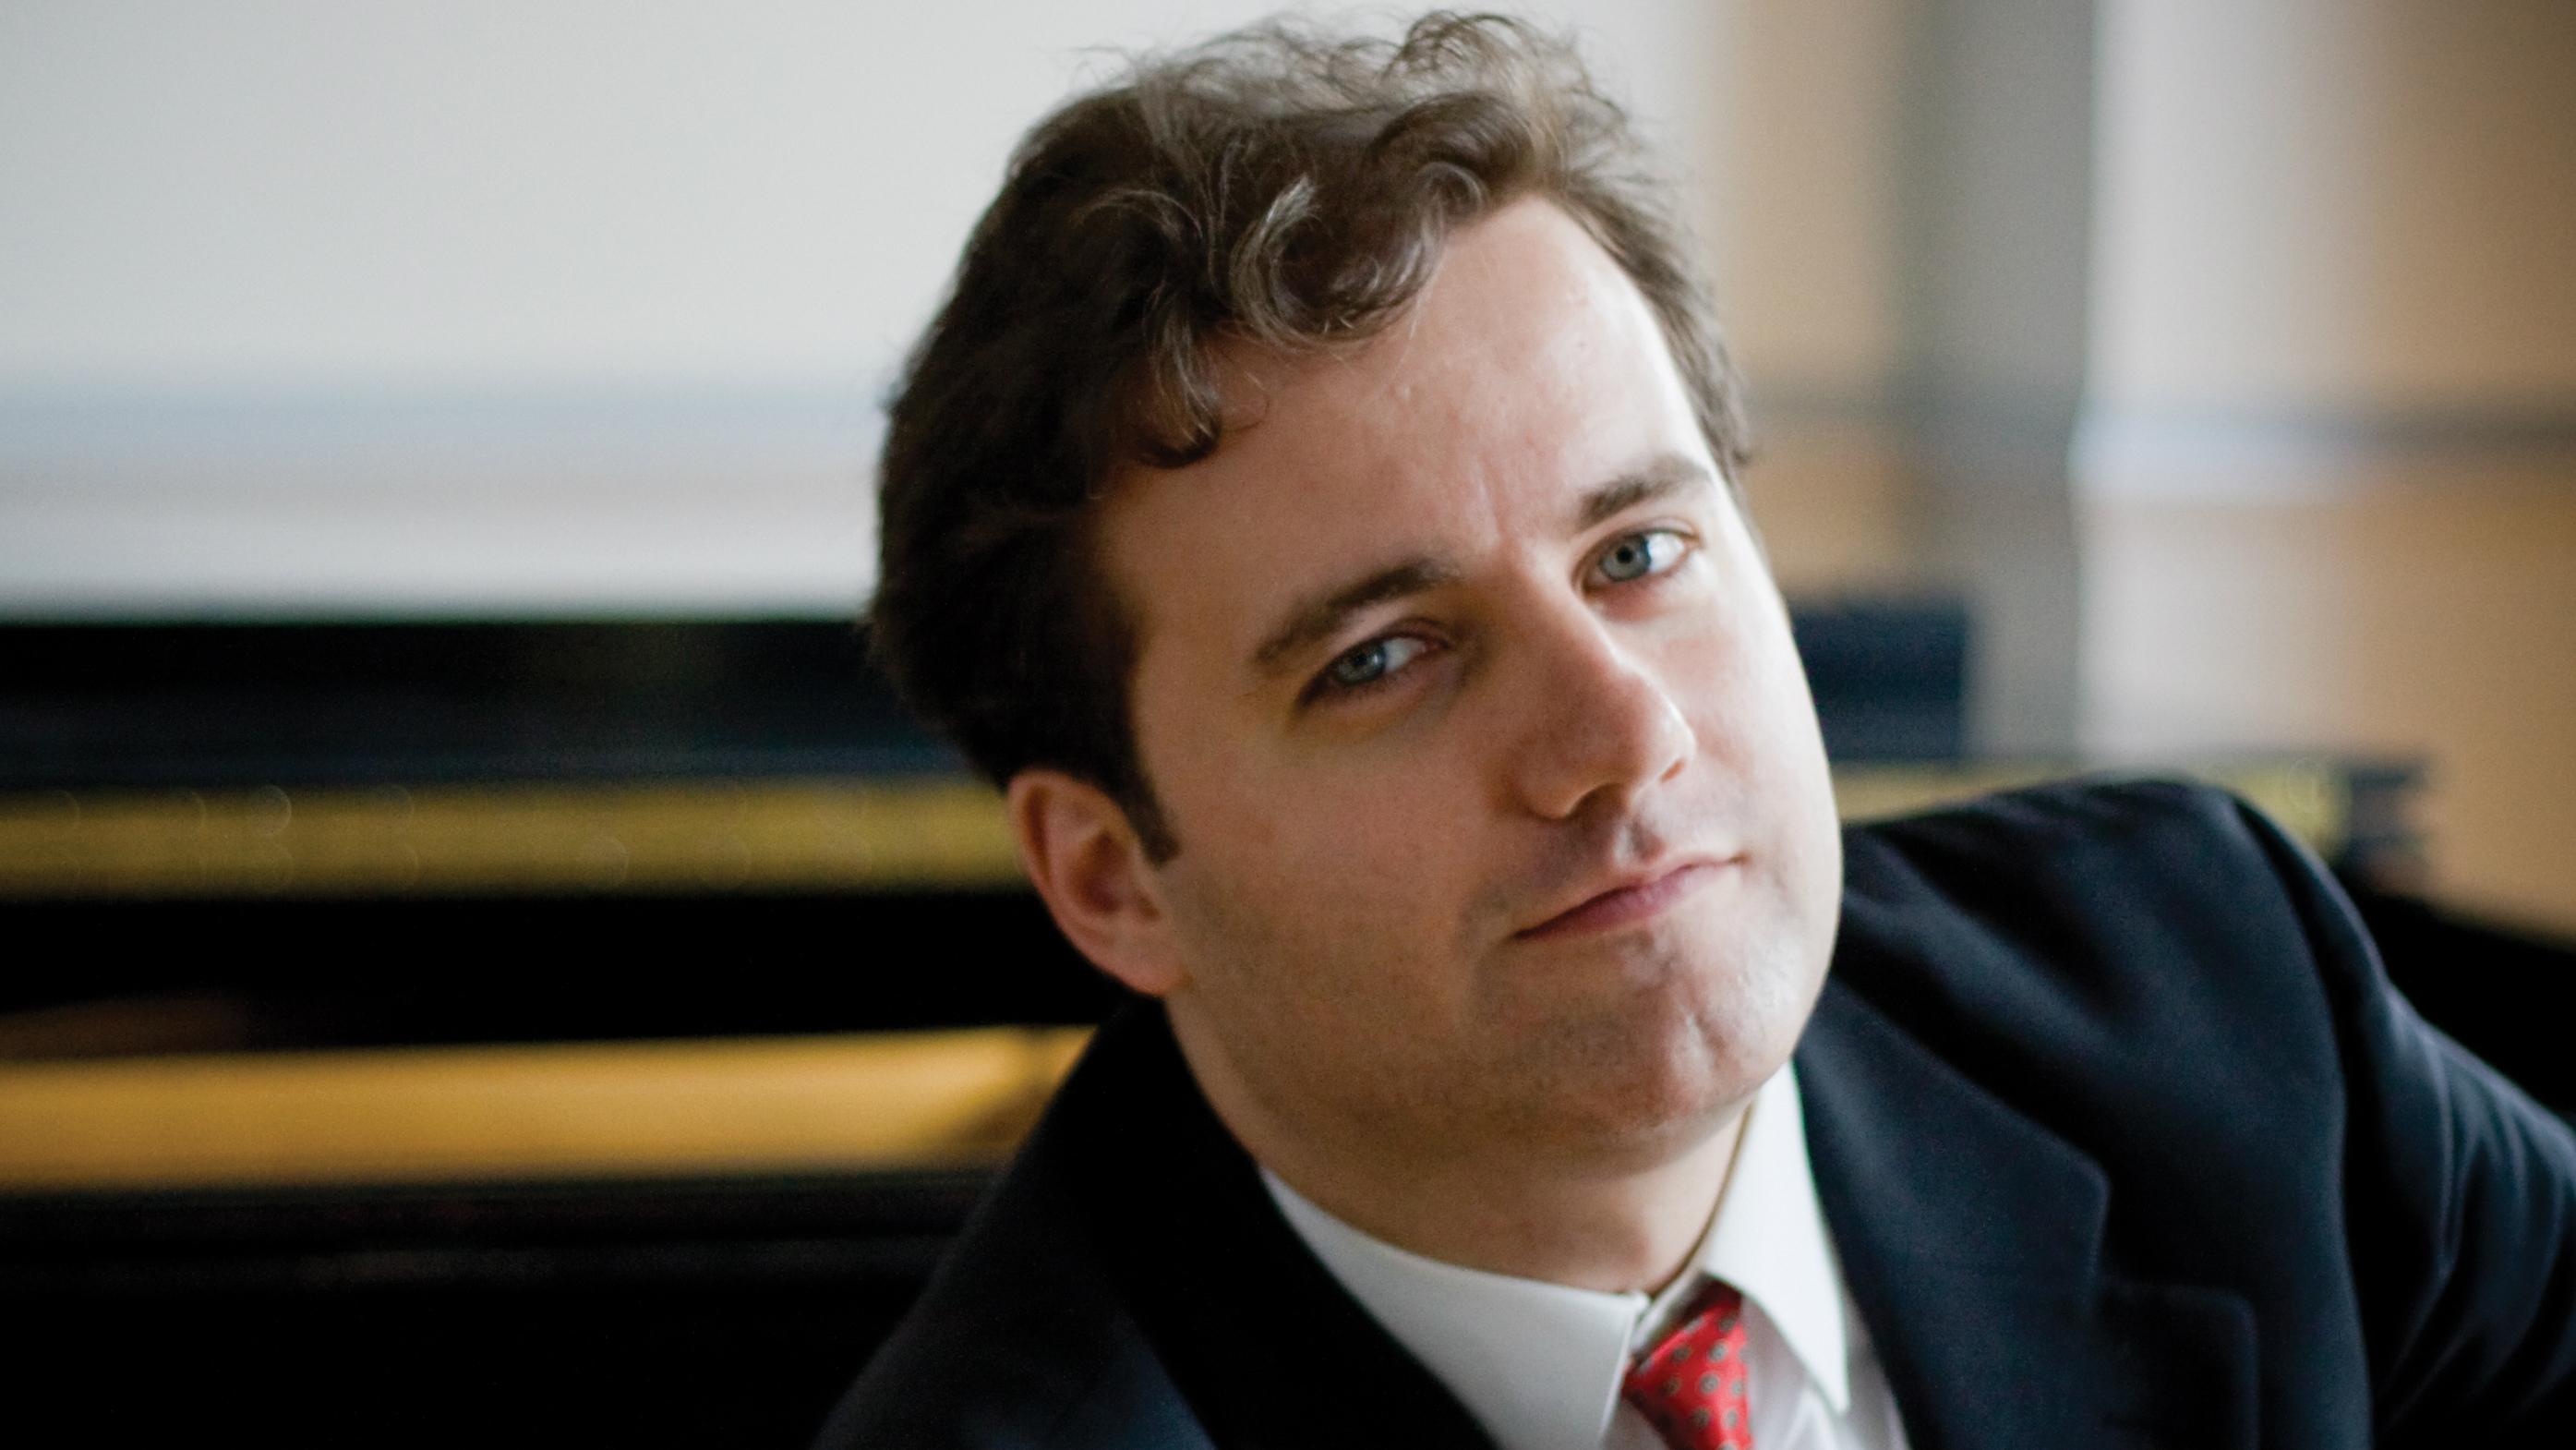 Vasily Petrenko debuta con la Filarmónica de Berlín